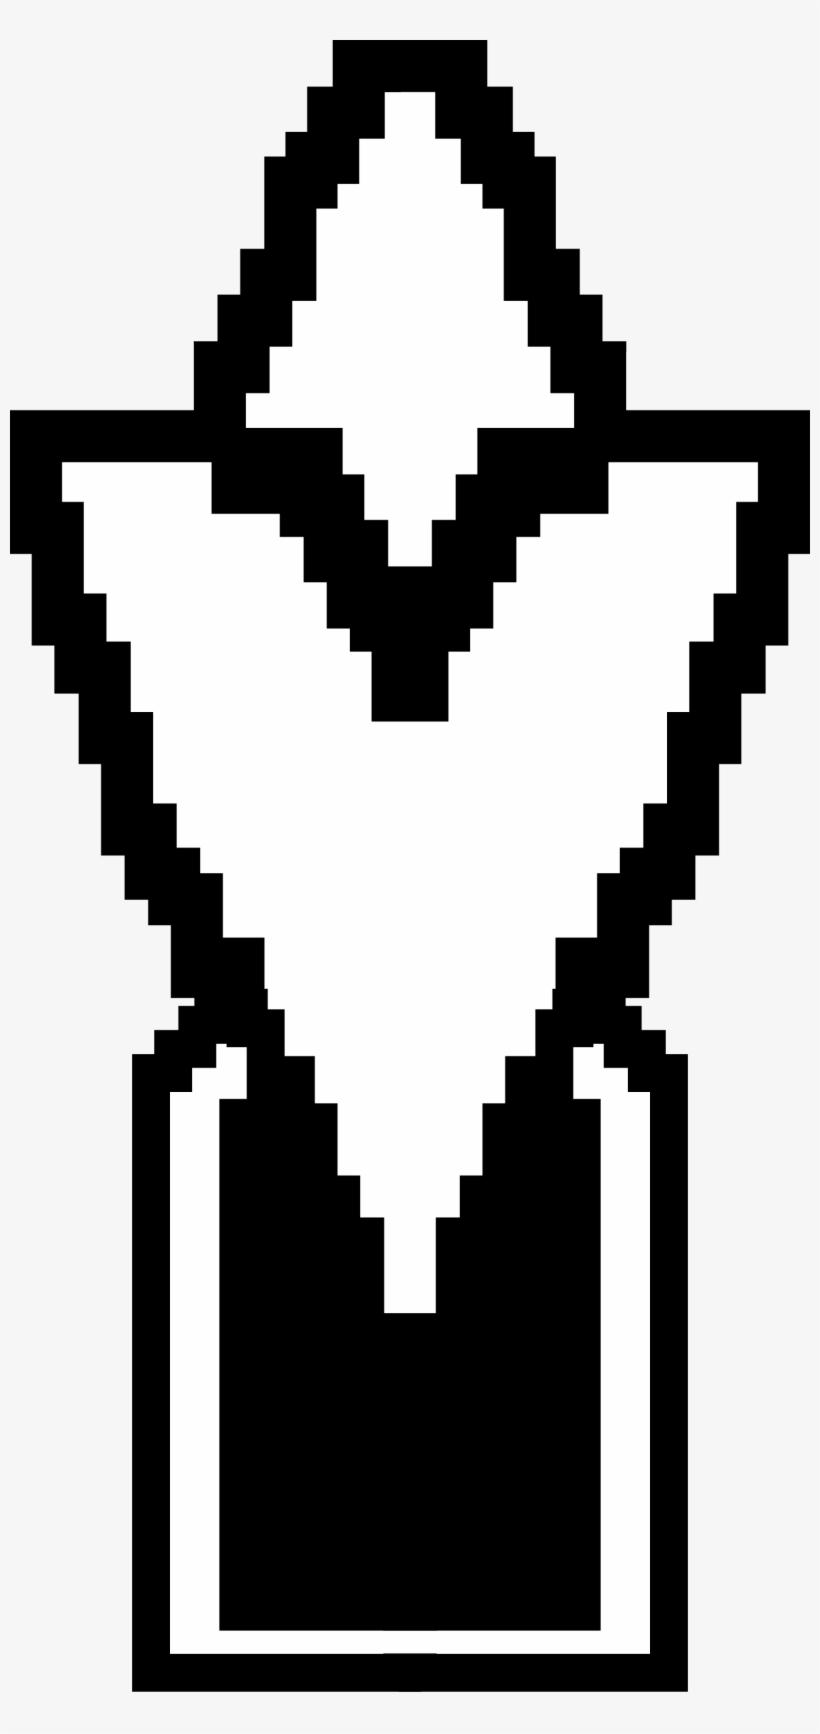 skyrim map symbols